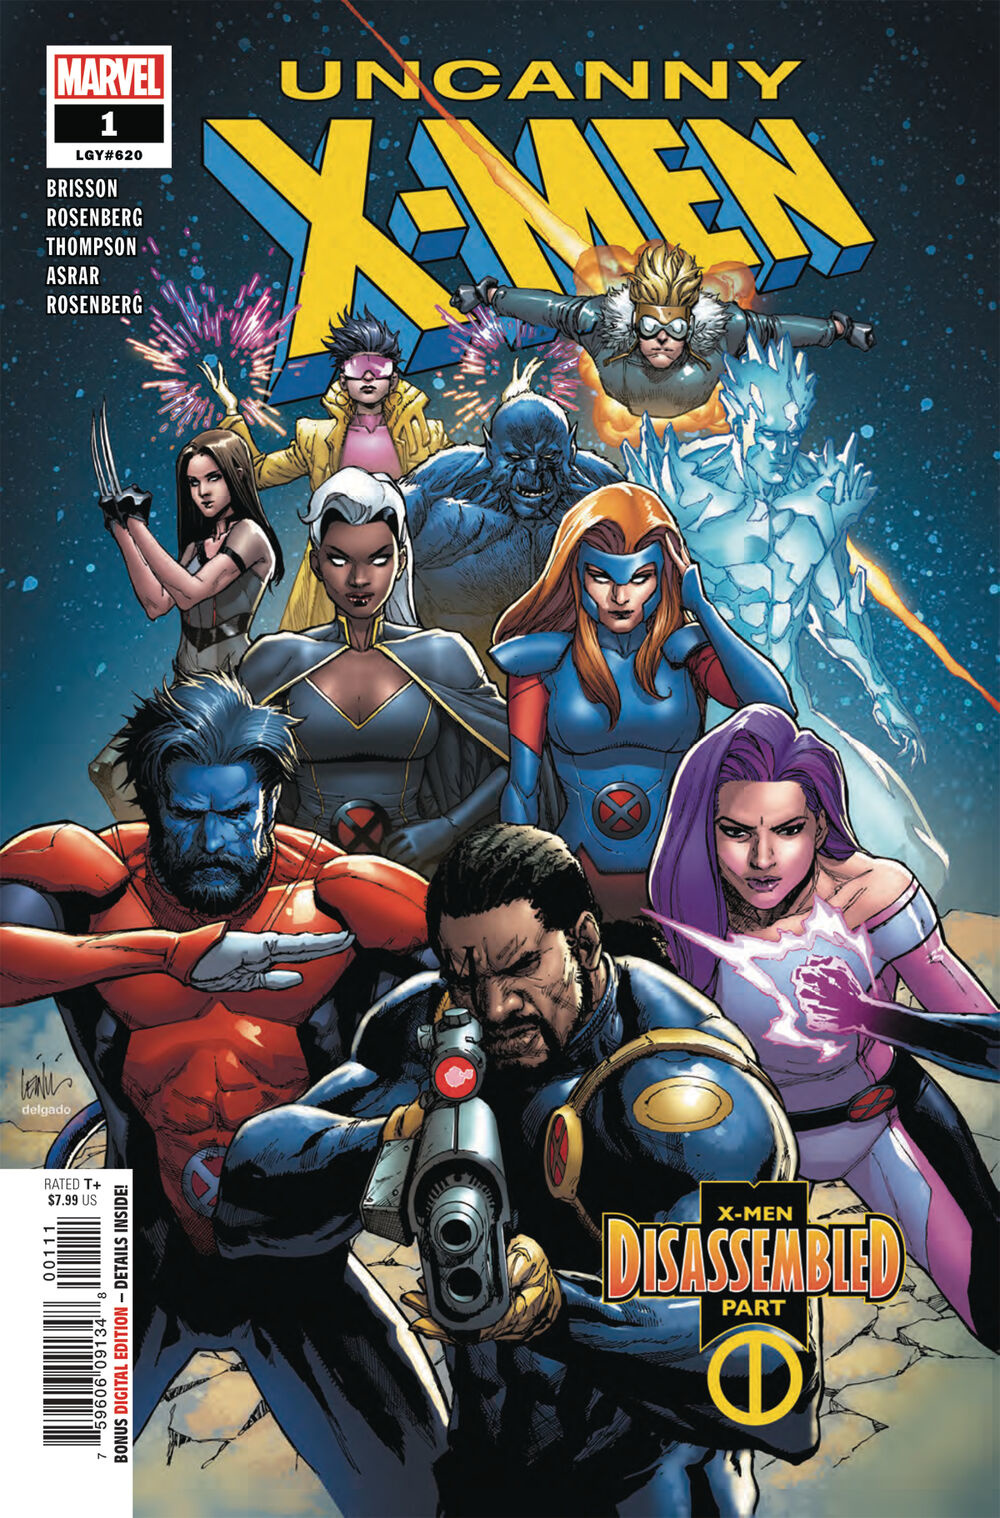 Uncanny X-Men #1-#10 (2018 5th Series)